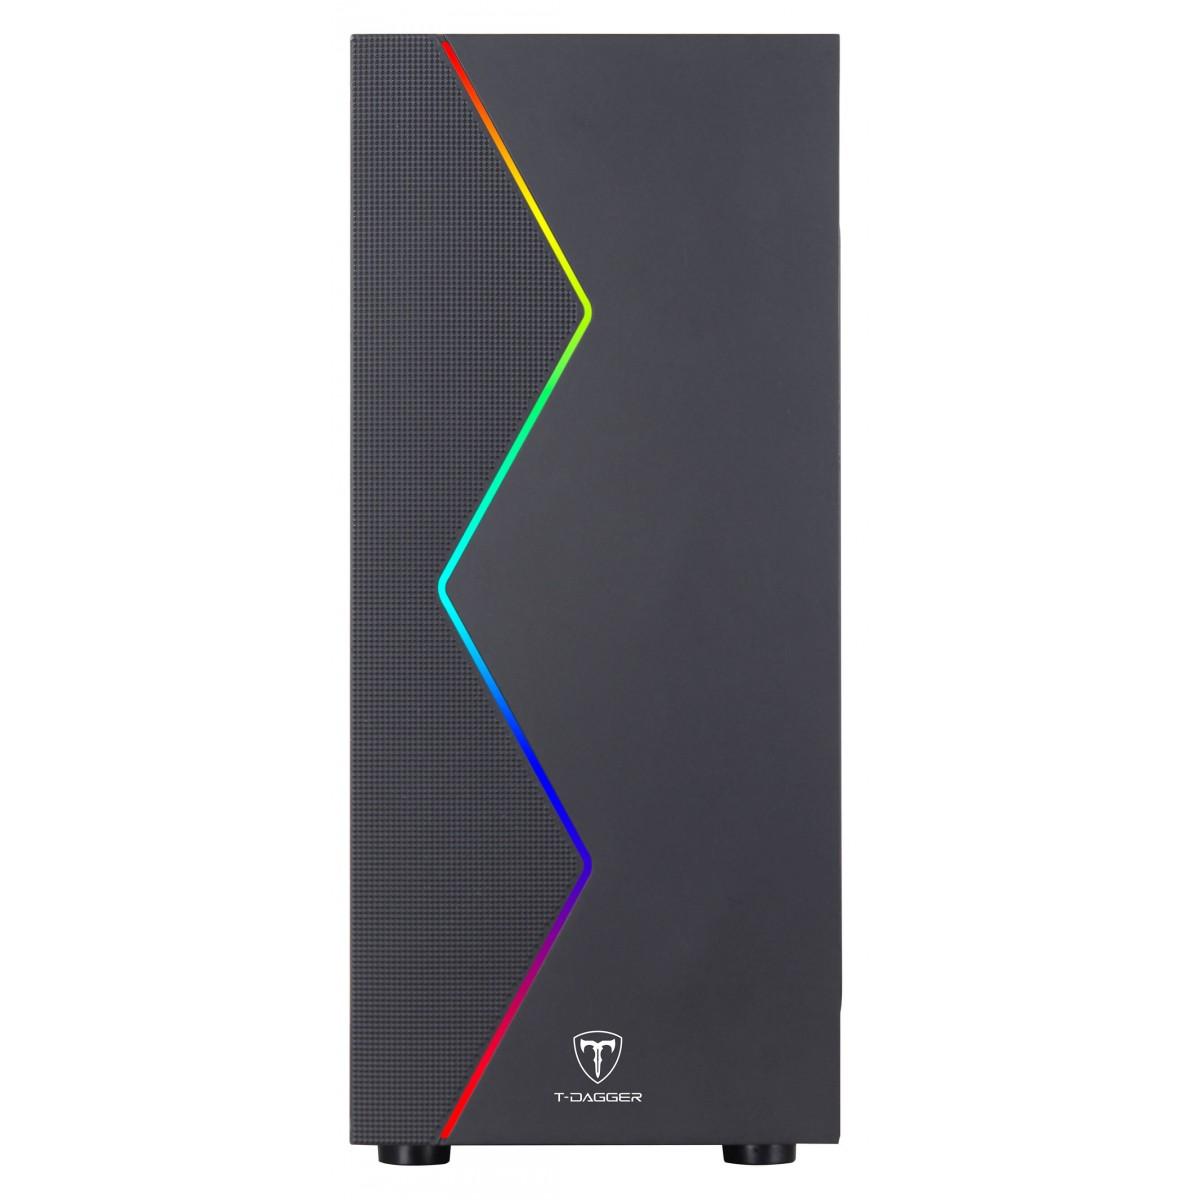 Gabinete Gamer T-Dagger P03B, Mid Tower, RGB, Black, ATX, Sem Fonte, Sem Fan, TGC-P03B